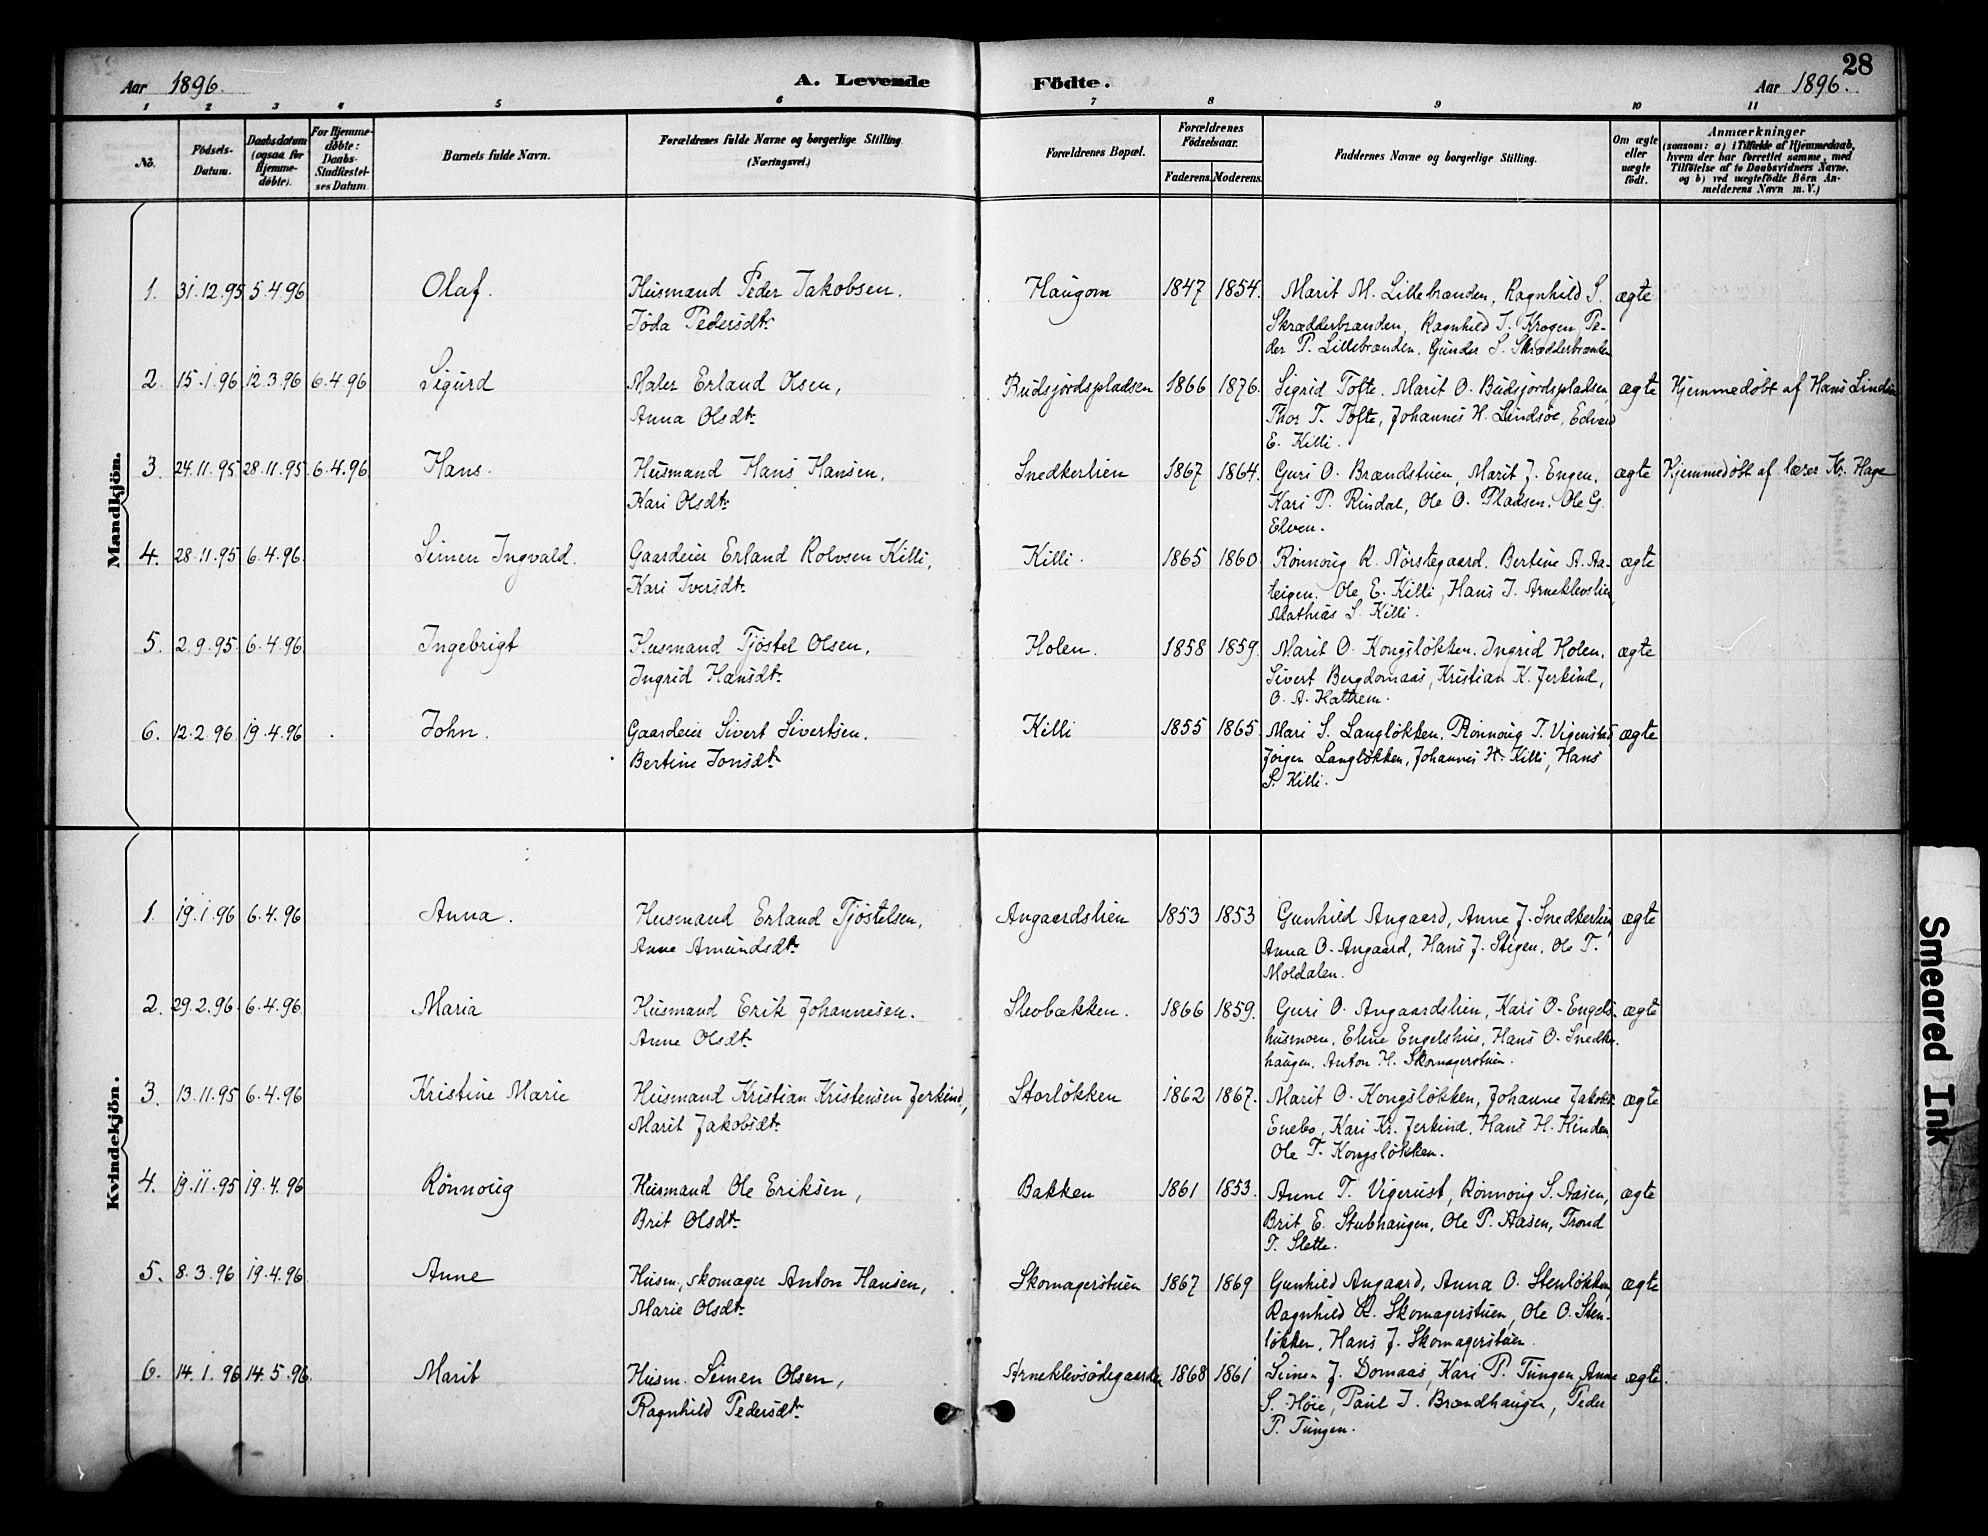 SAH, Dovre prestekontor, Ministerialbok nr. 3, 1891-1901, s. 28